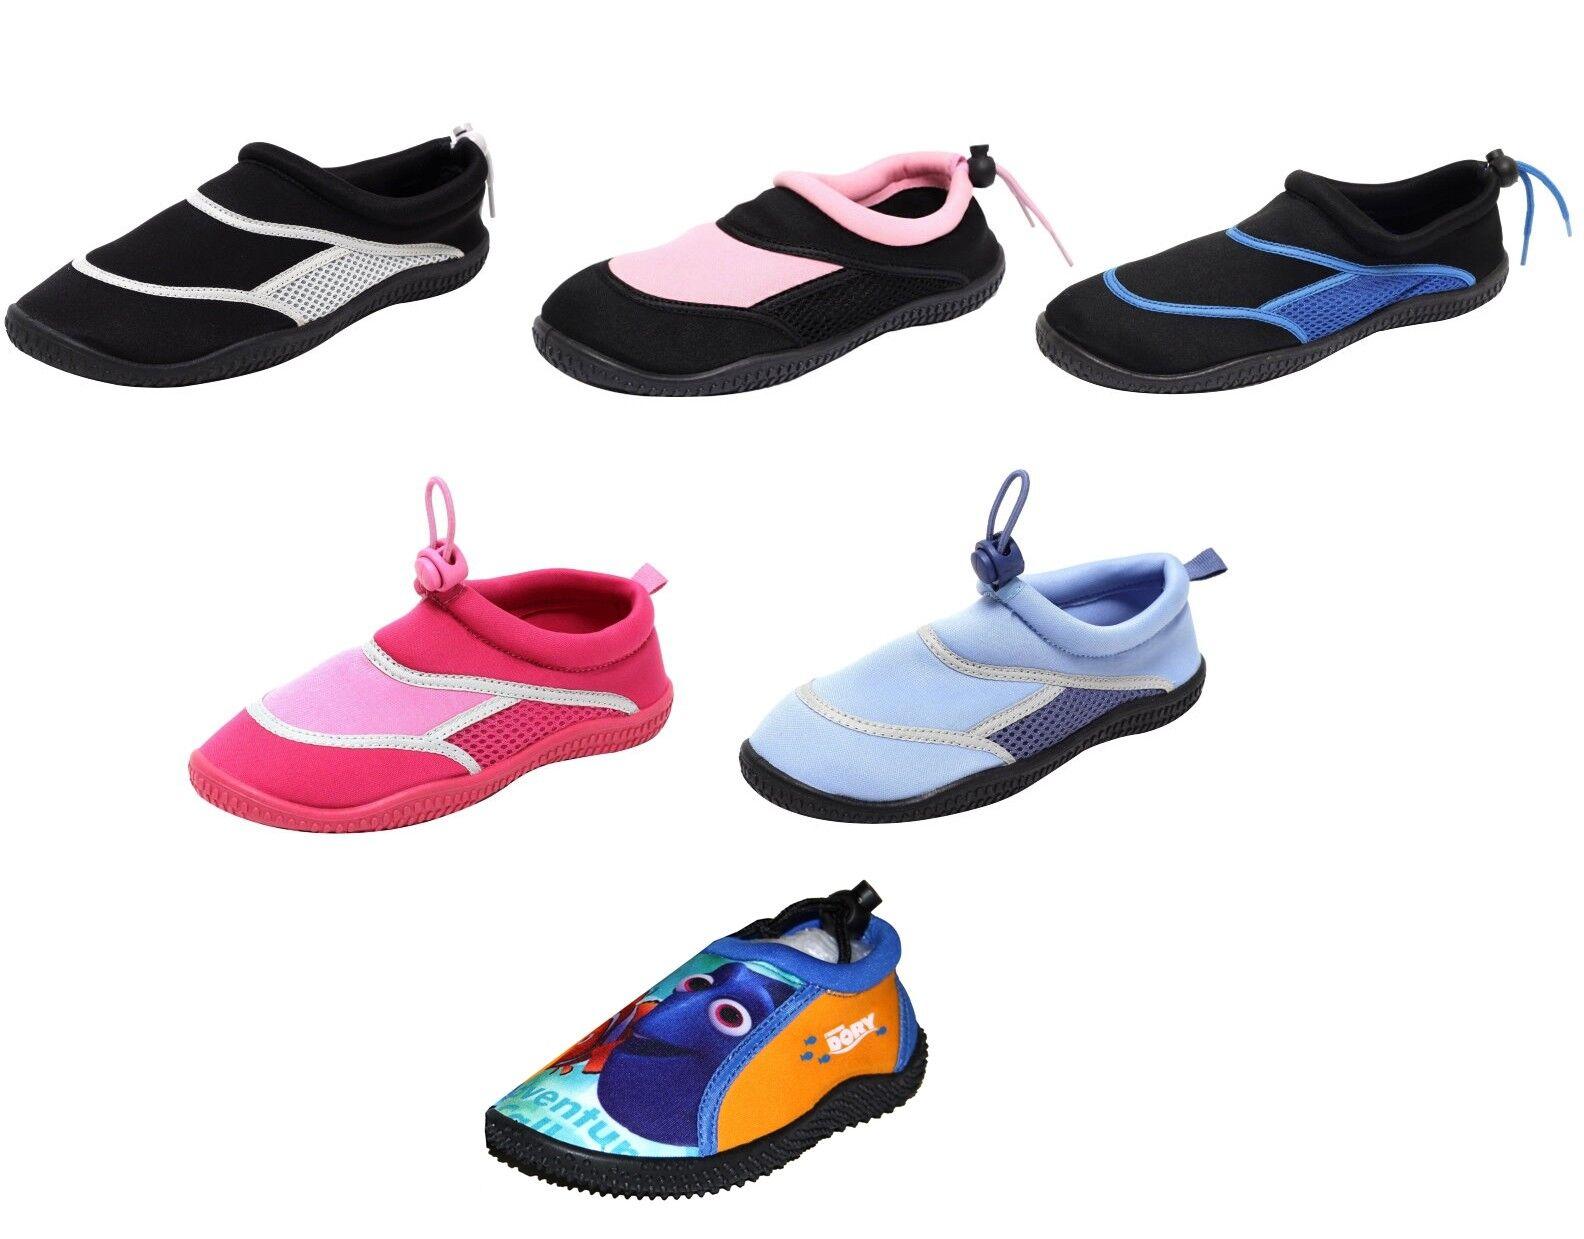 Damen Herren Kinder Aquaschuhe Neopren Wasserschuhe Surfschuhe Strand Schuhe